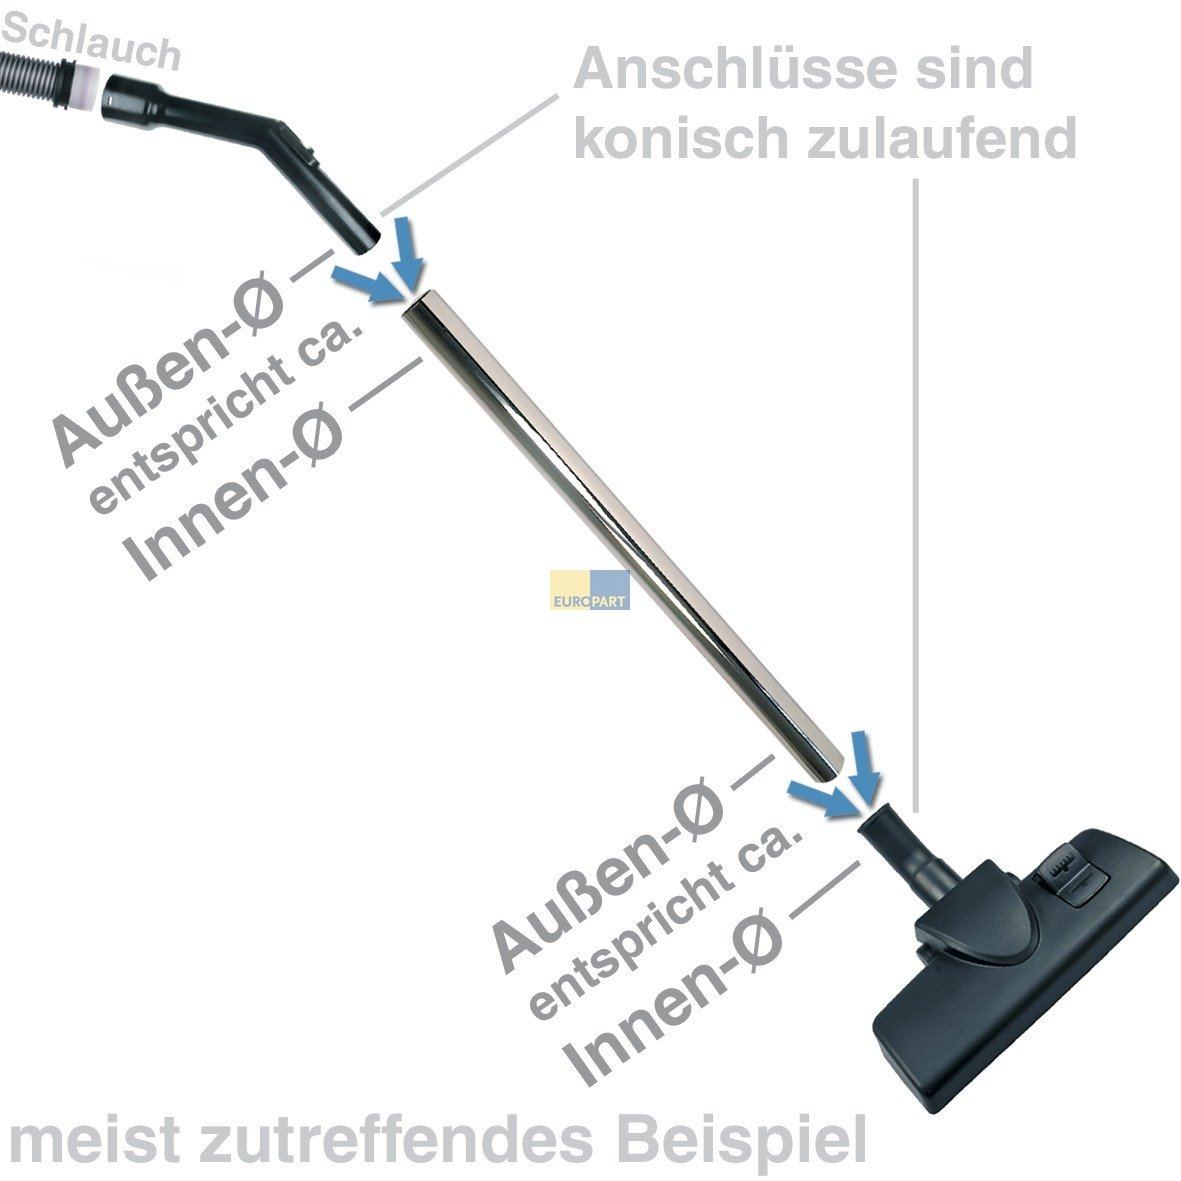 Staubsauger Bodenstaubsauger Staubsaugerdüse Bodendüse Original Electrolux Aeg 2190735627 219073562 umschaltbar…